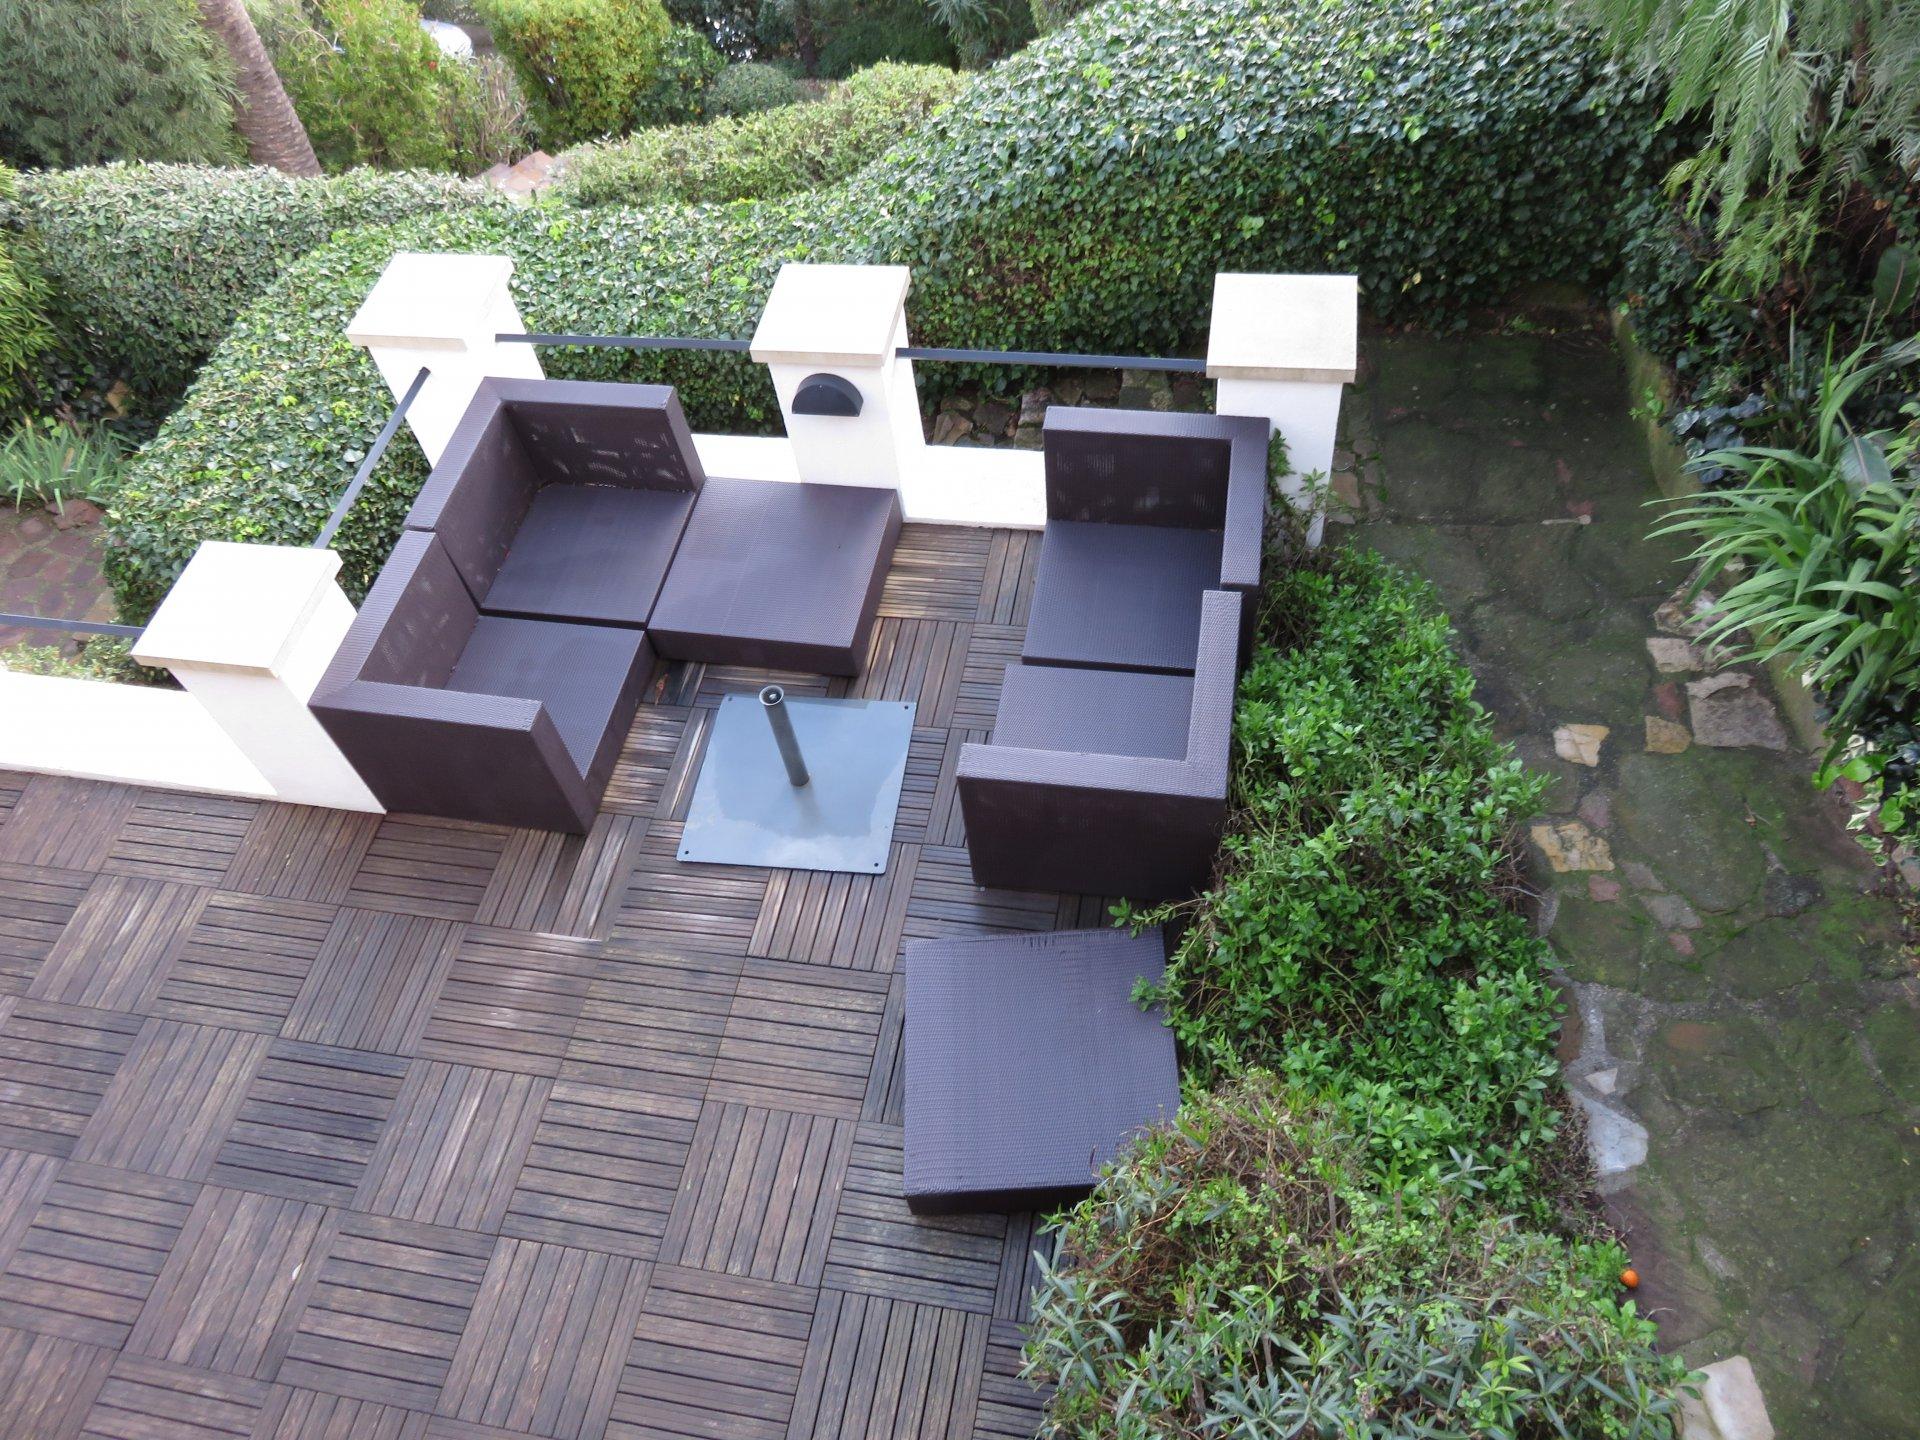 Villa 4 pièces avec vue mer - garage - piscine